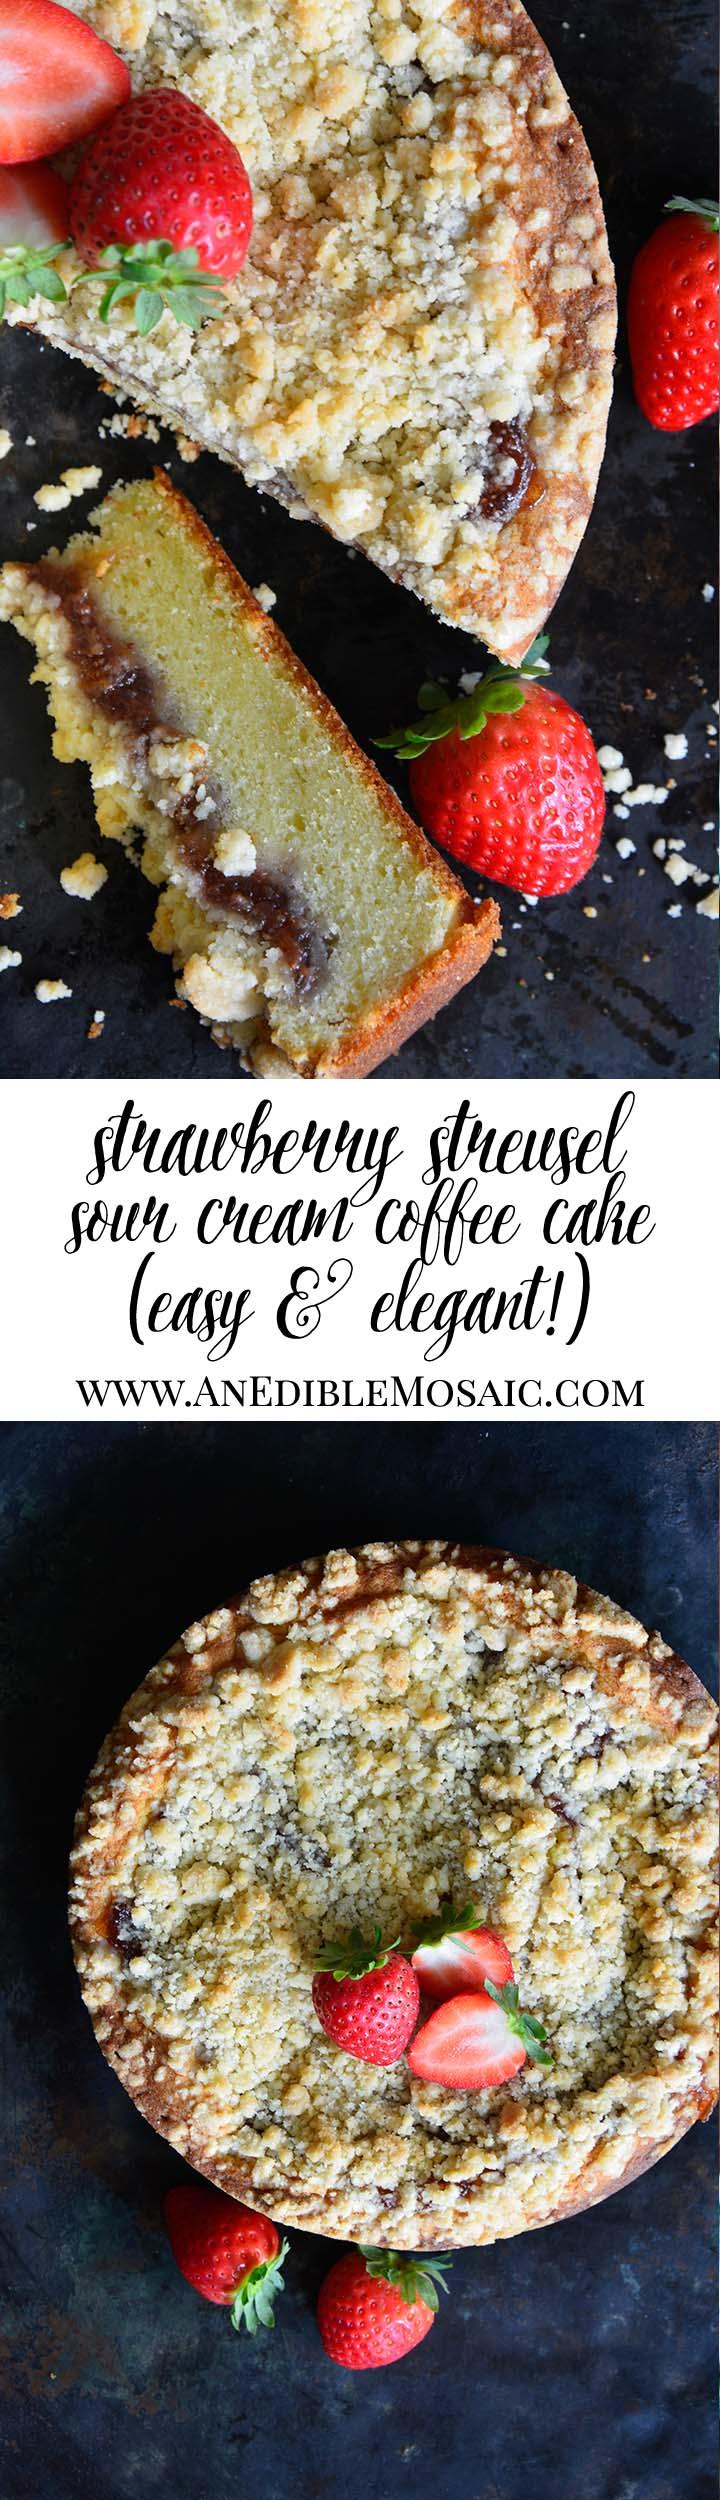 Strawberry Streusel Sour Cream Coffee Cake Long Pin